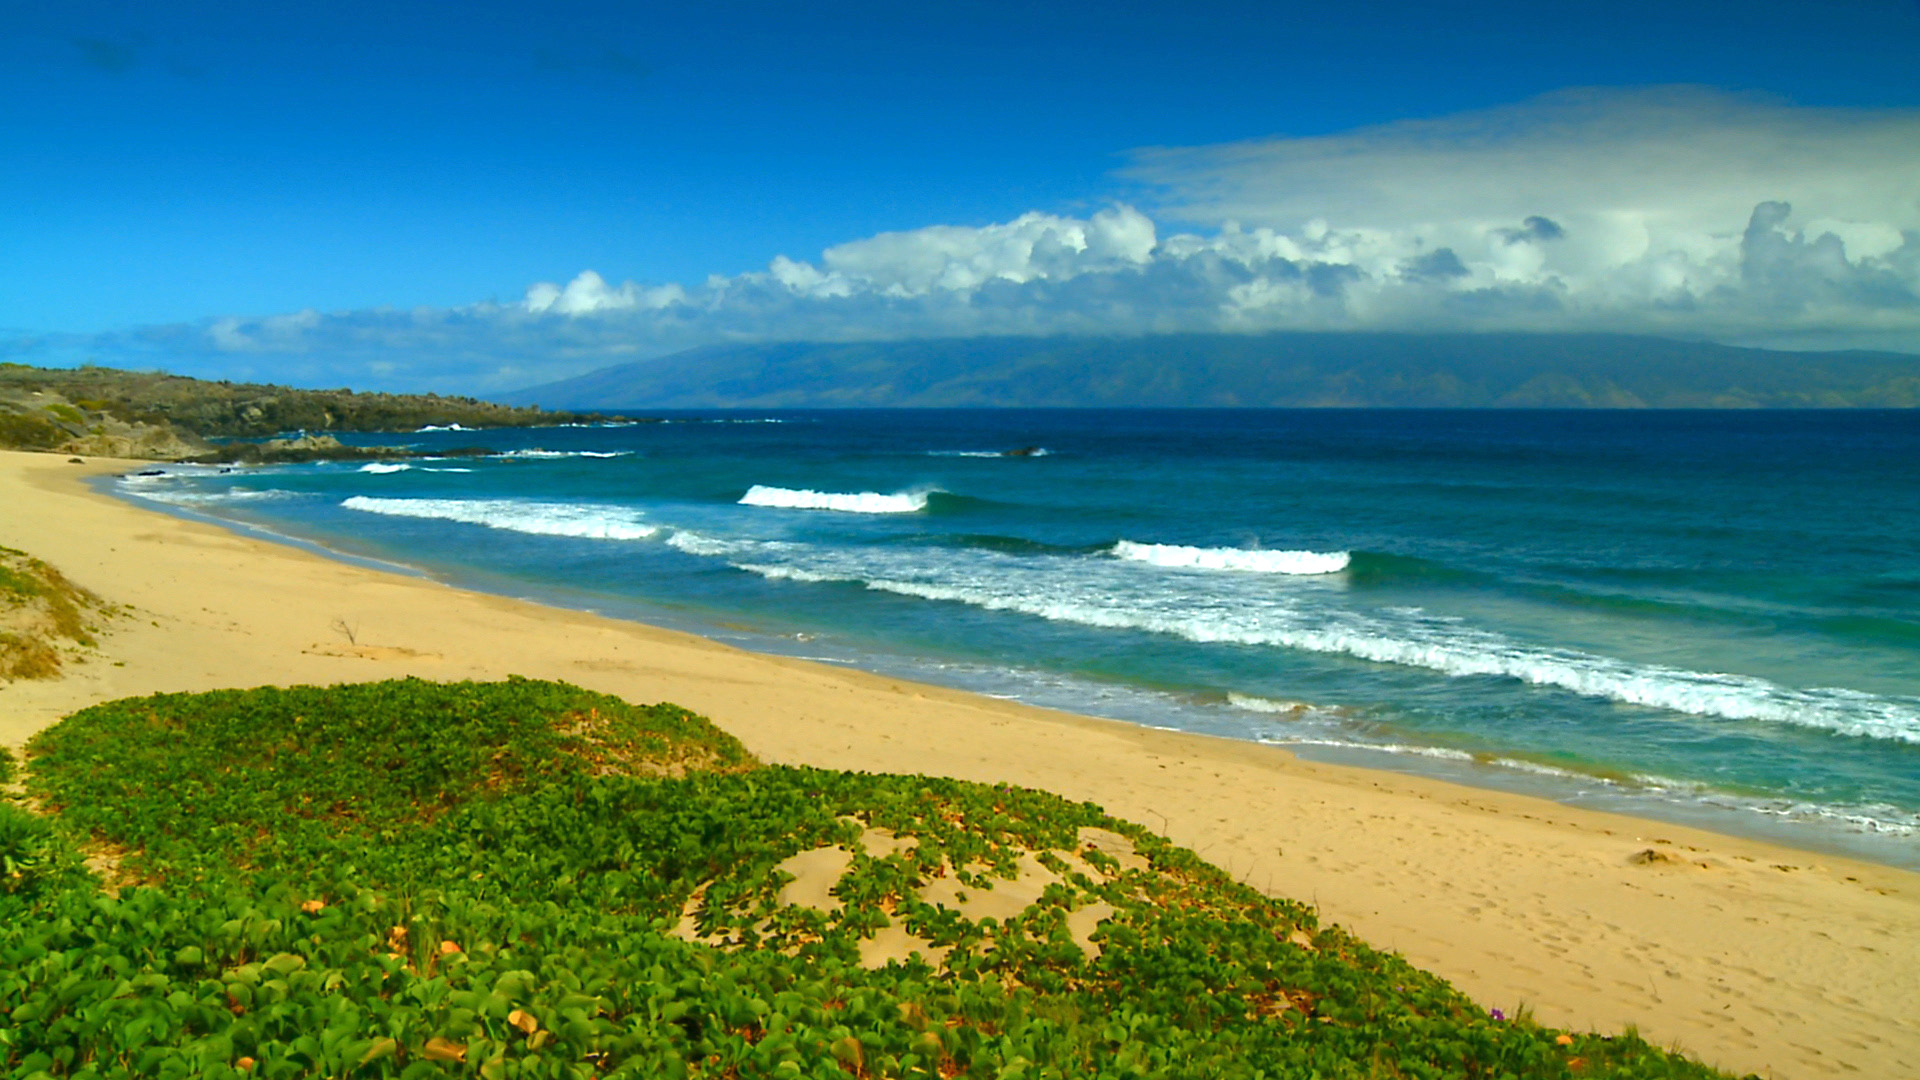 Hawaii Beaches wallpaper 43041